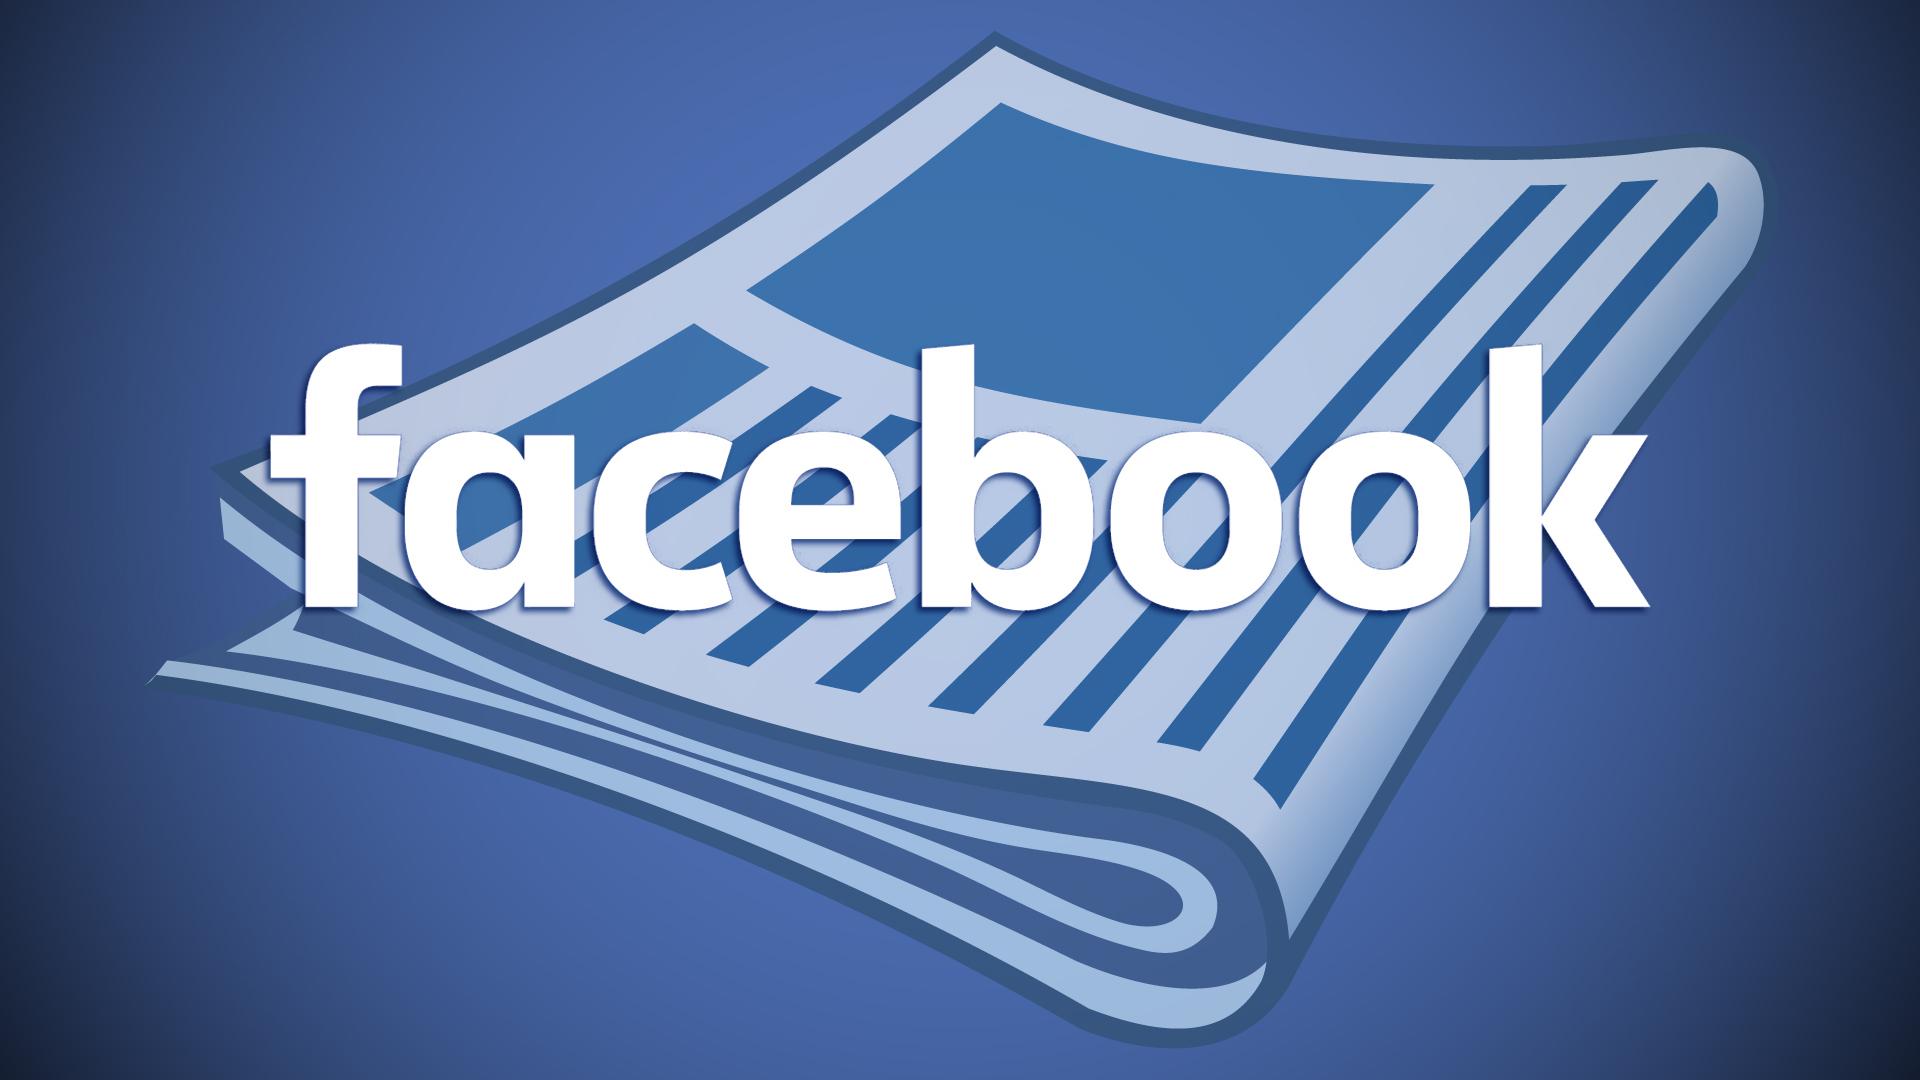 %E2%80%99Facebook,+habercileri+s%C3%B6m%C3%BCr%C3%BCyor%E2%80%99